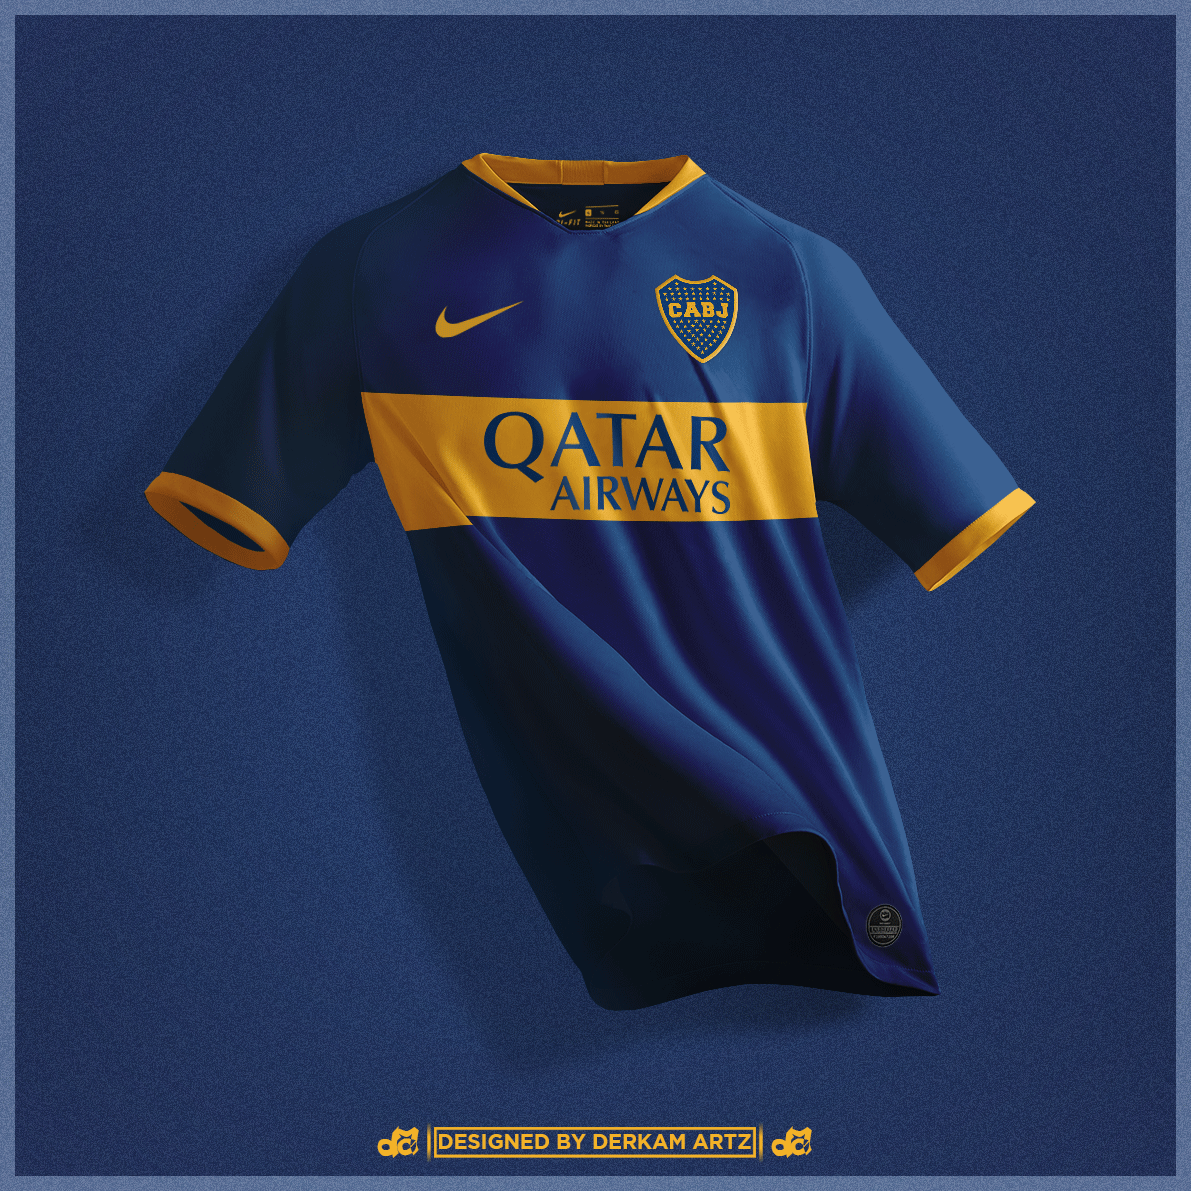 separation shoes 22dd9 0524a Boca Juniors - Home Kit (2019/20)